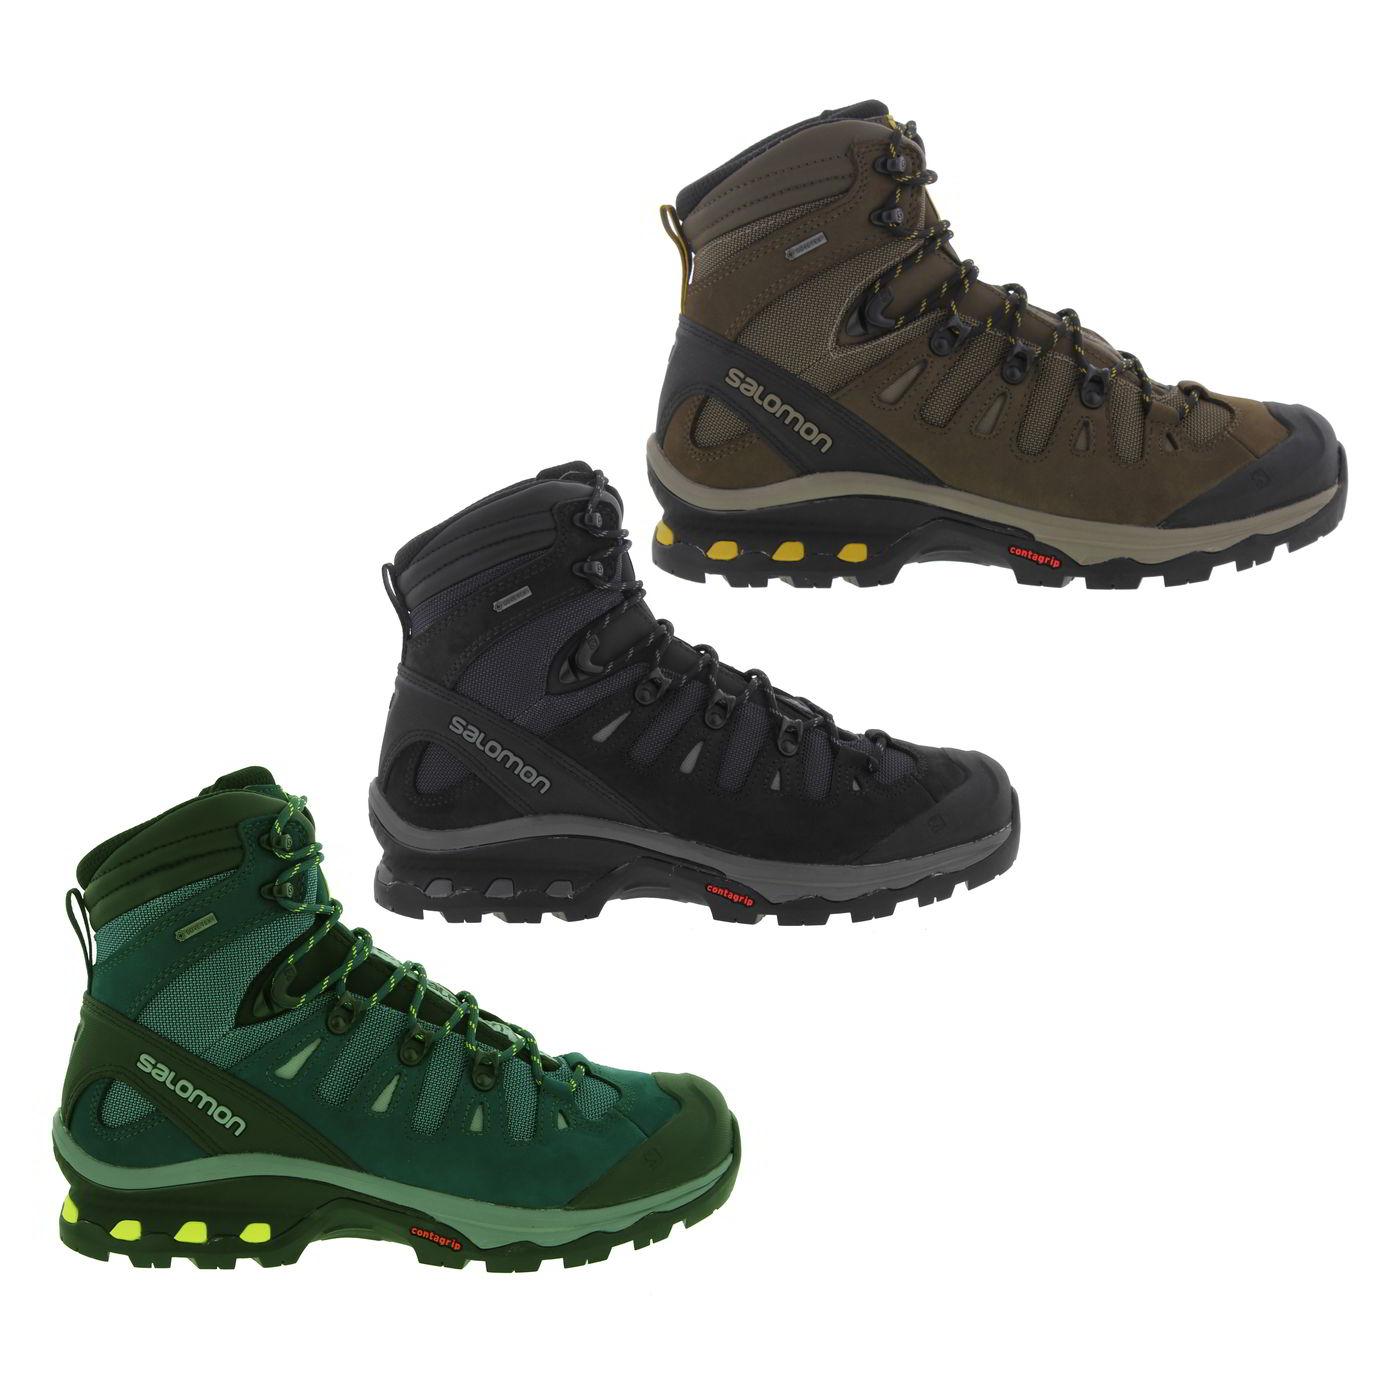 Salomon Quest 4d 3 Gtx Walking Boots Mallard Blue